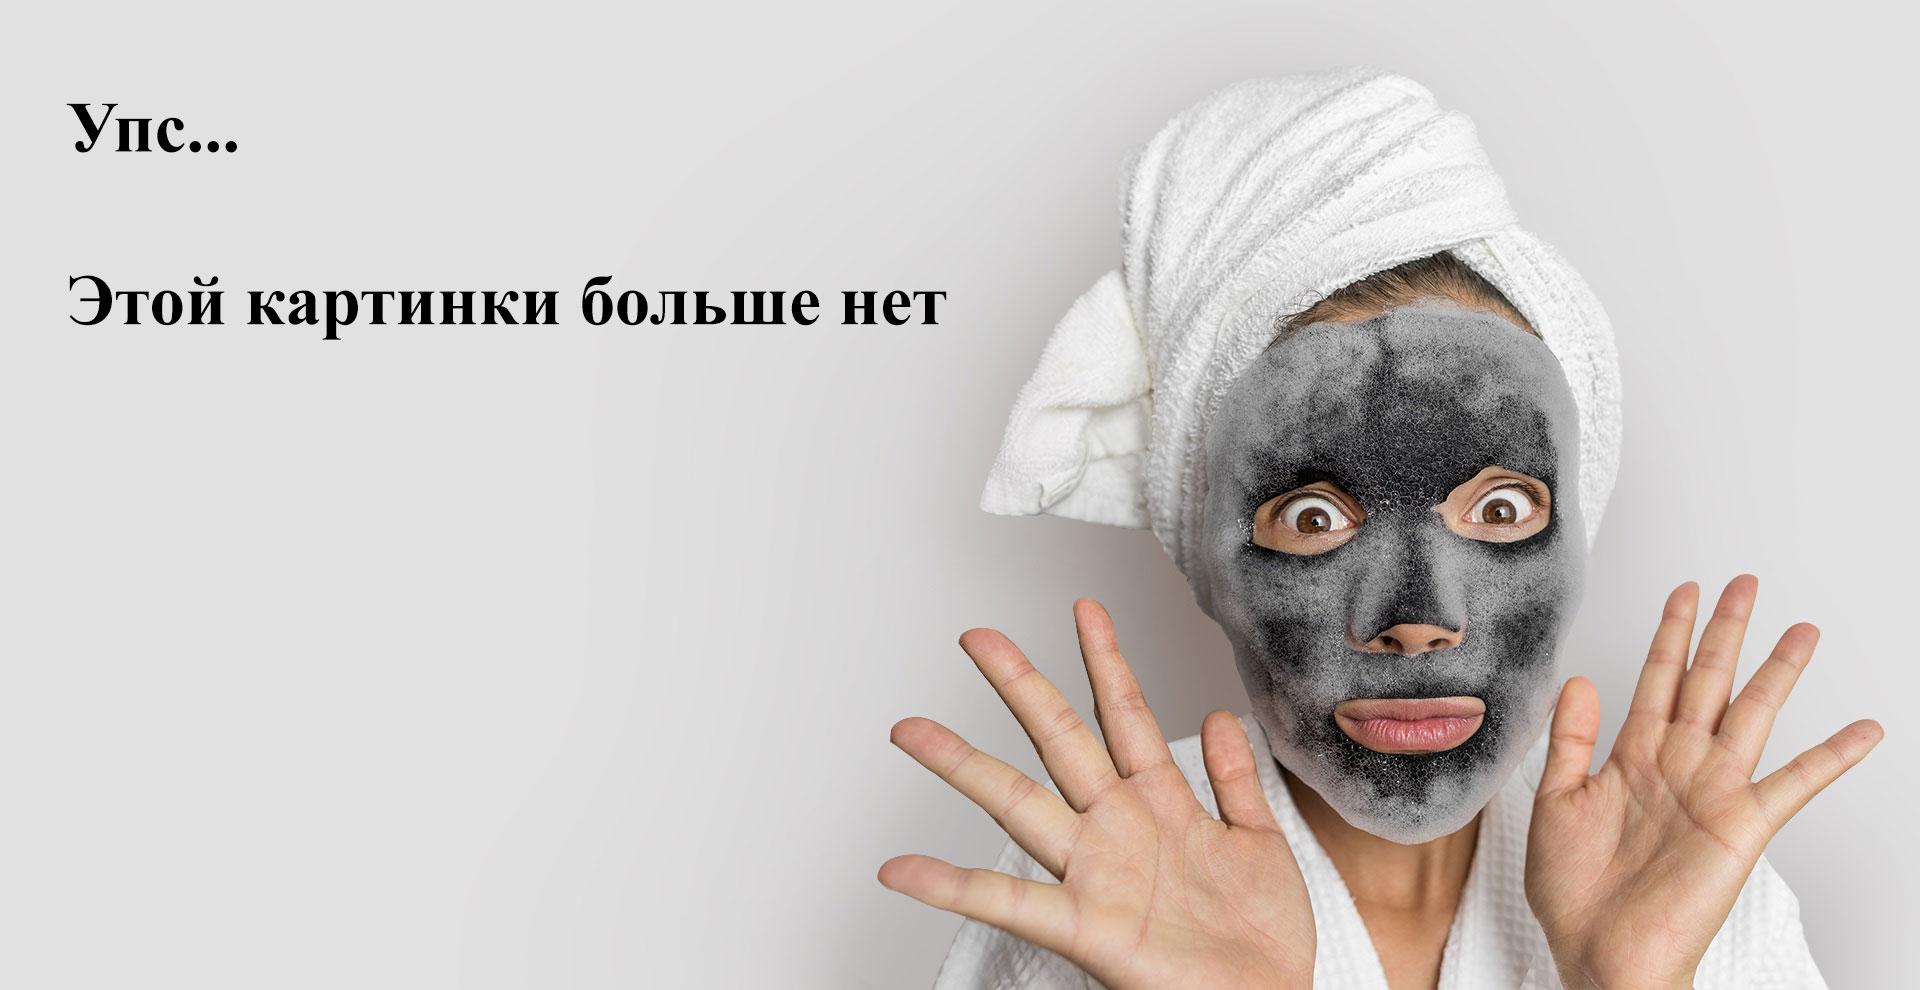 Vivienne Sabo, Губная помада Merci, тон 03